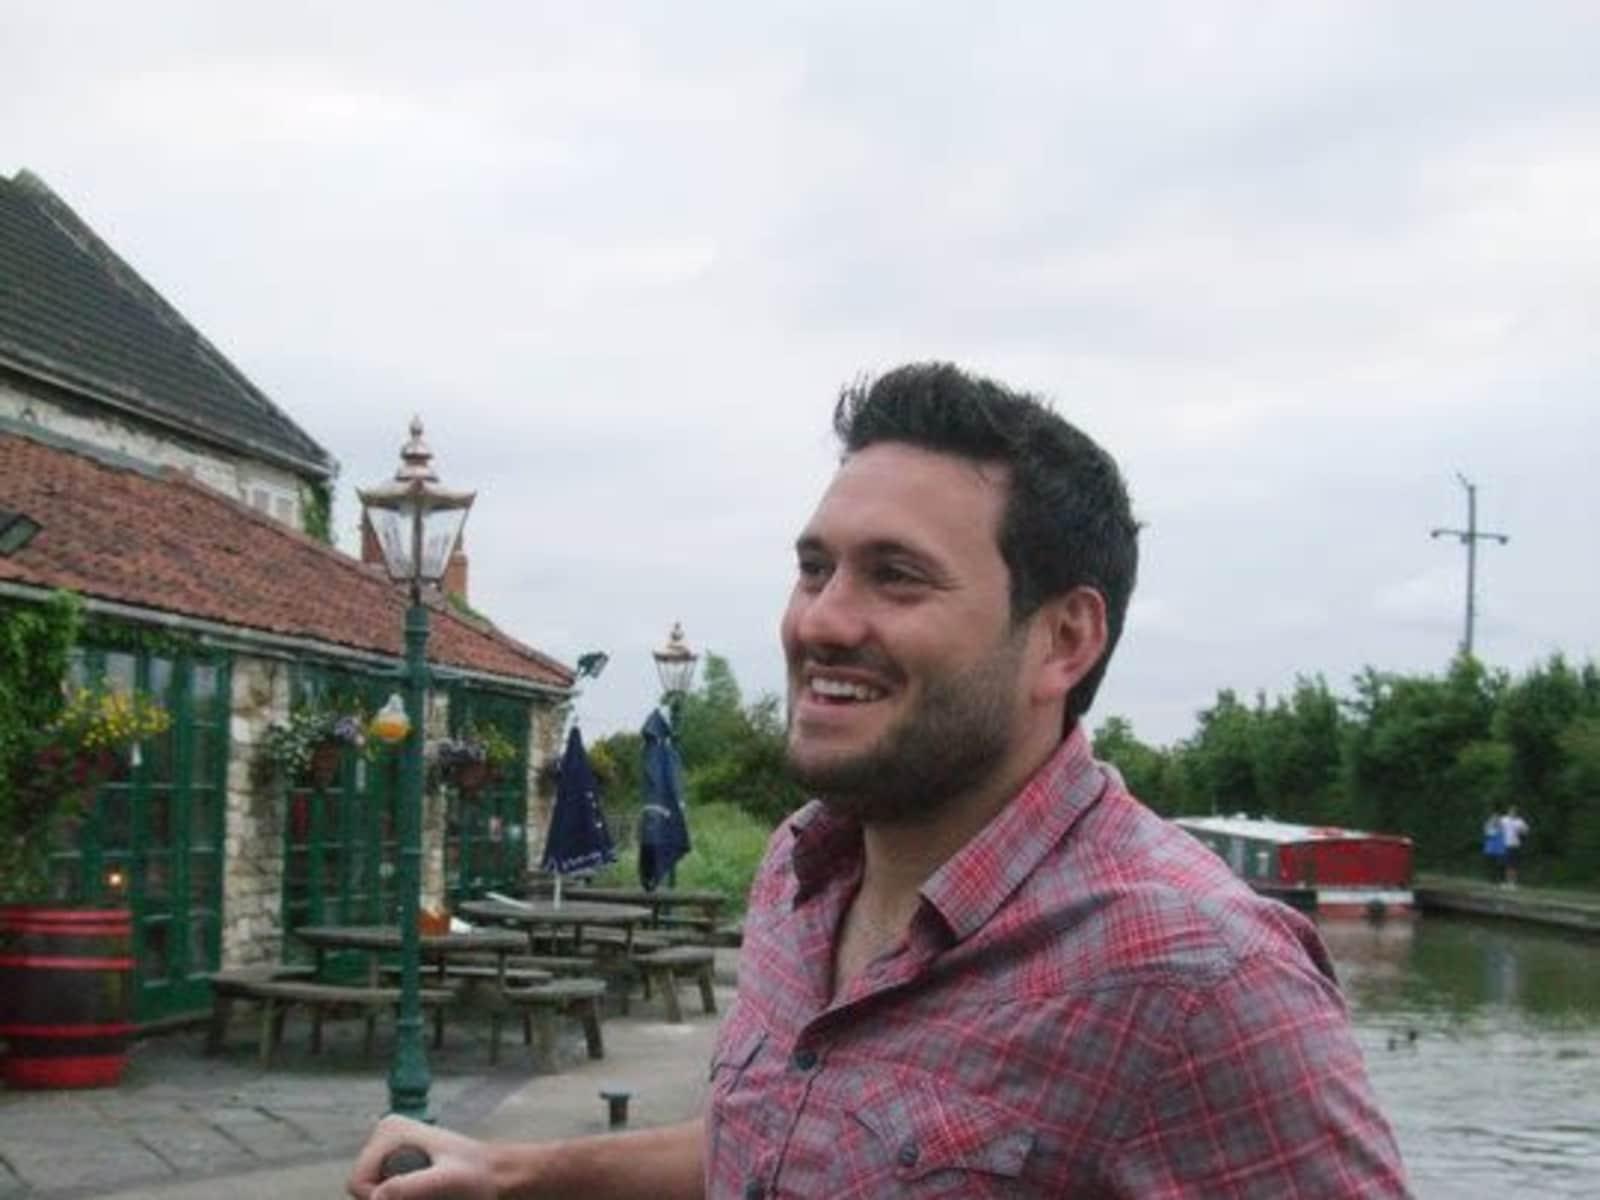 Jon from Hull, United Kingdom